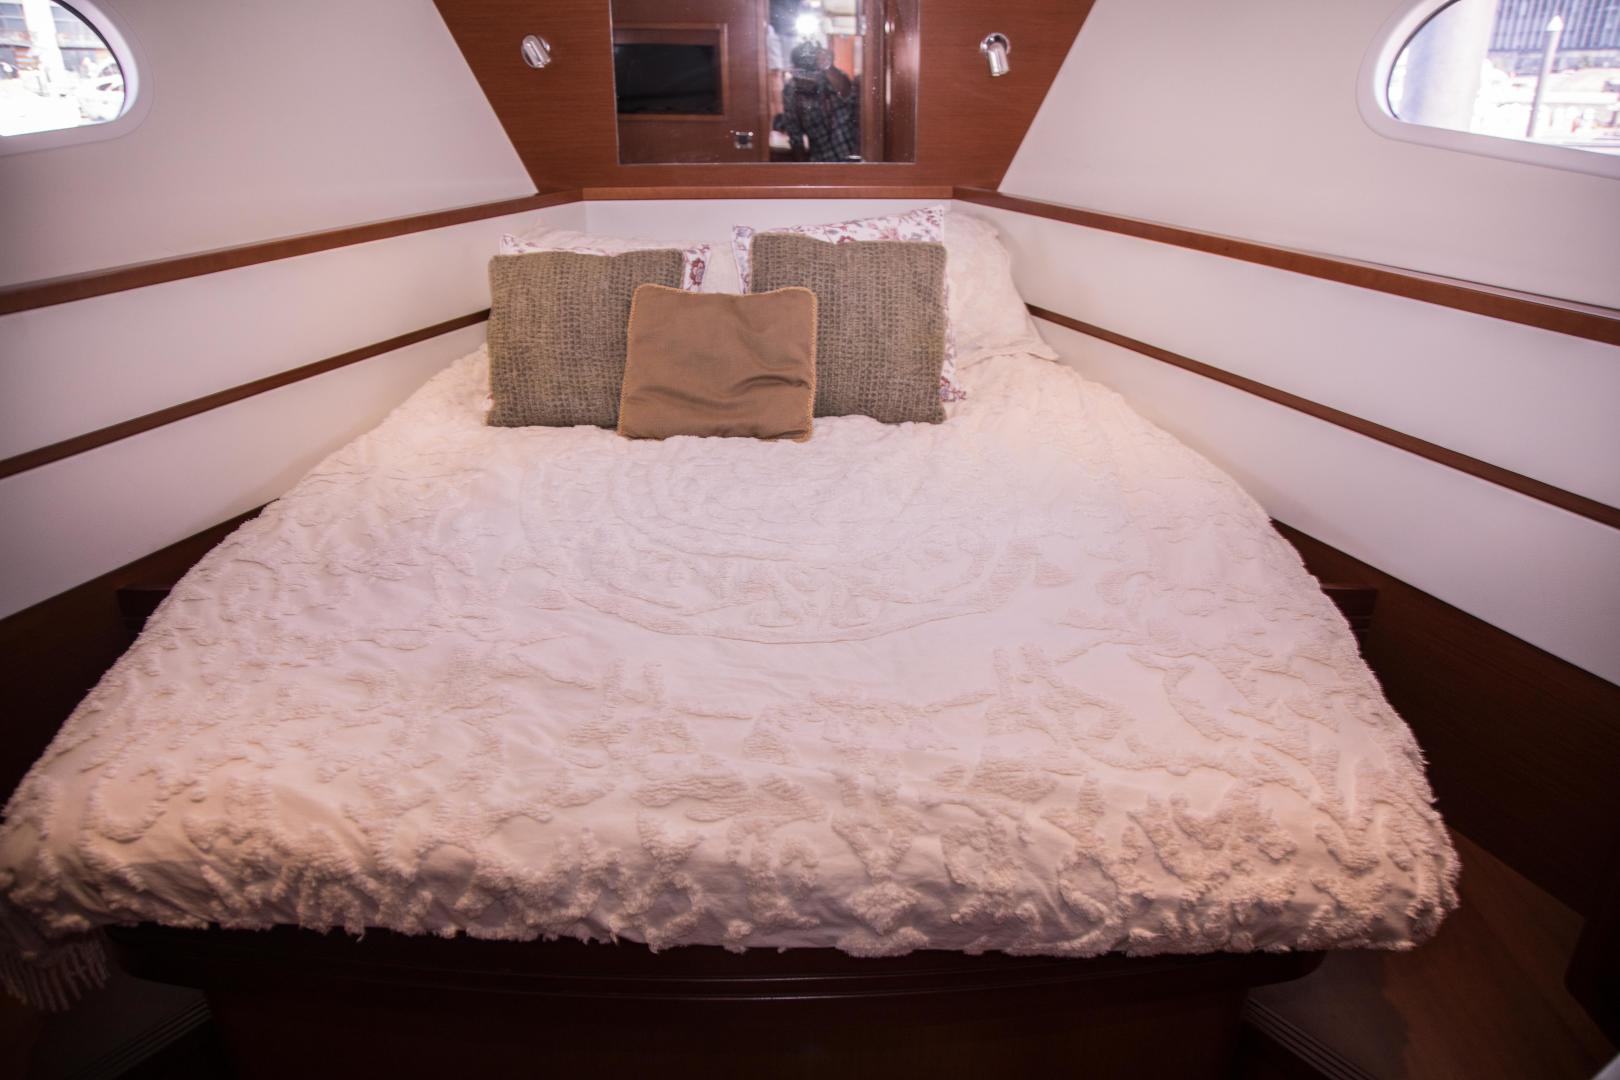 Beneteau-Swift Trawler 2012-MLC IV Baltimore-Maryland-United States-1355983 | Thumbnail